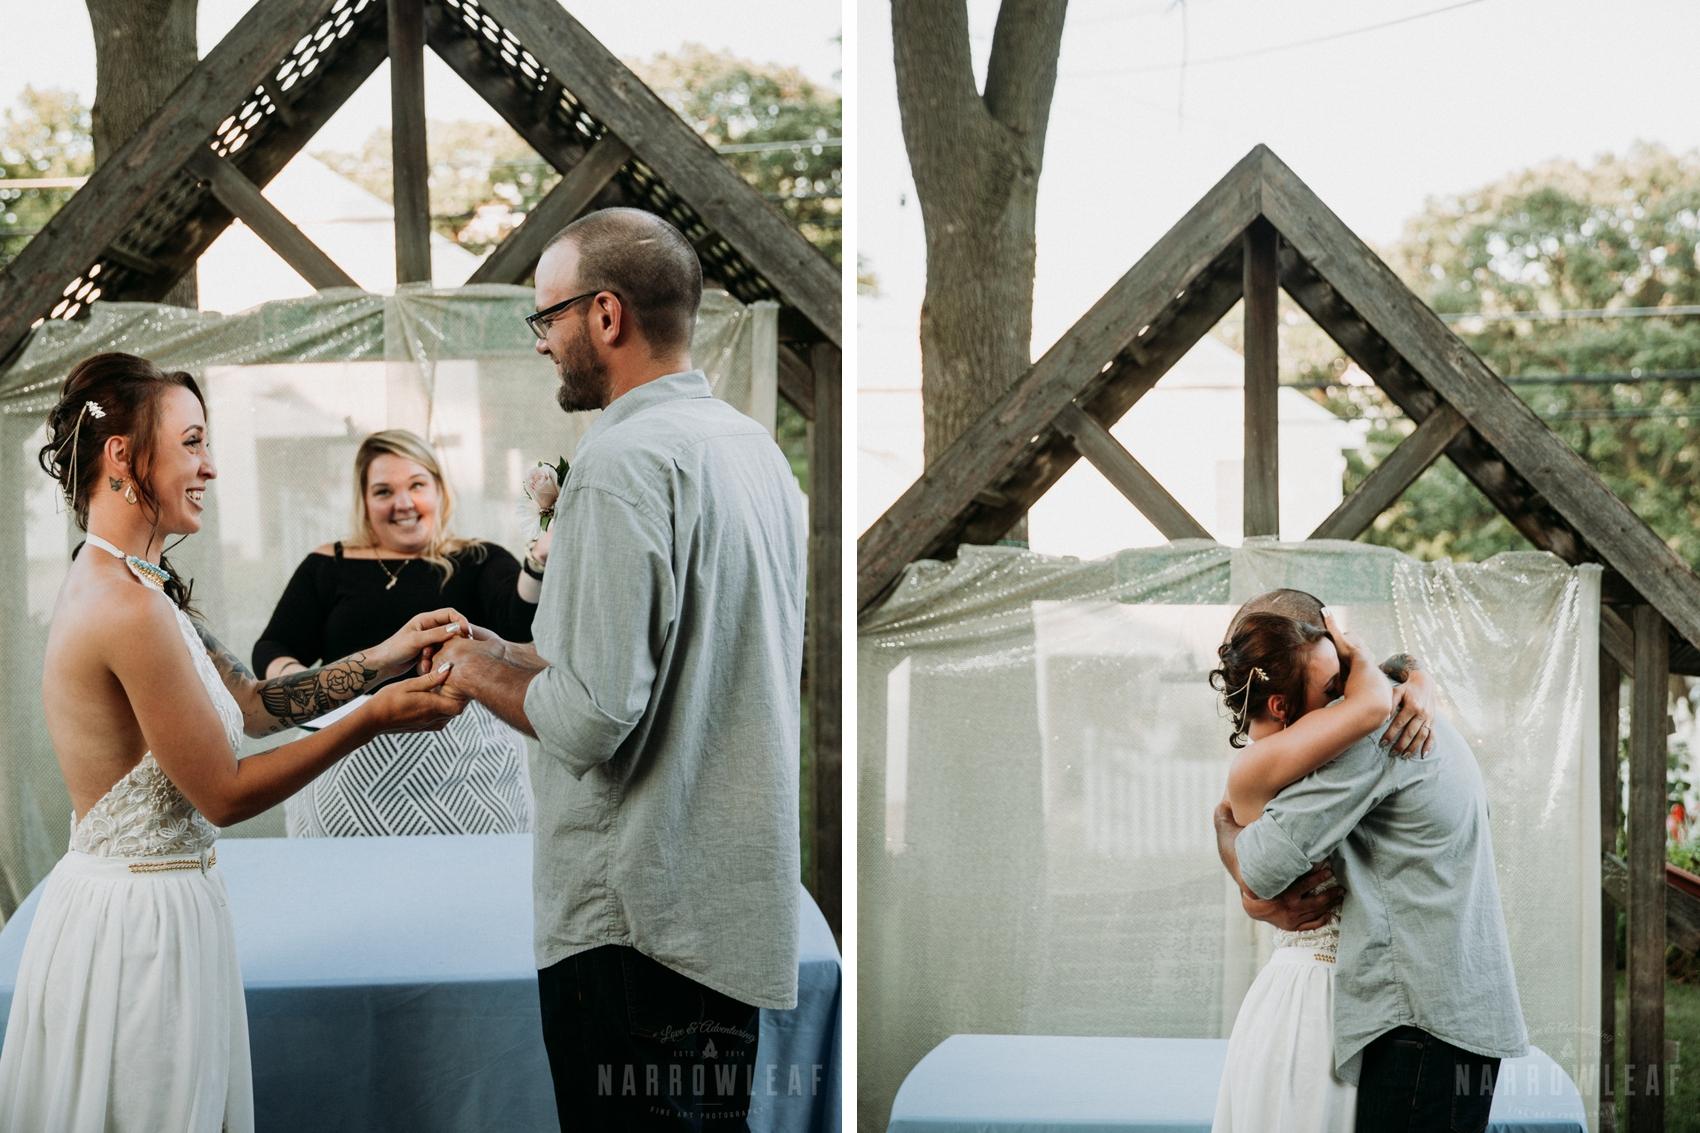 minnesota-outdoor-elopement-intimate-ceremony-narrowLeaf-photography.jpg